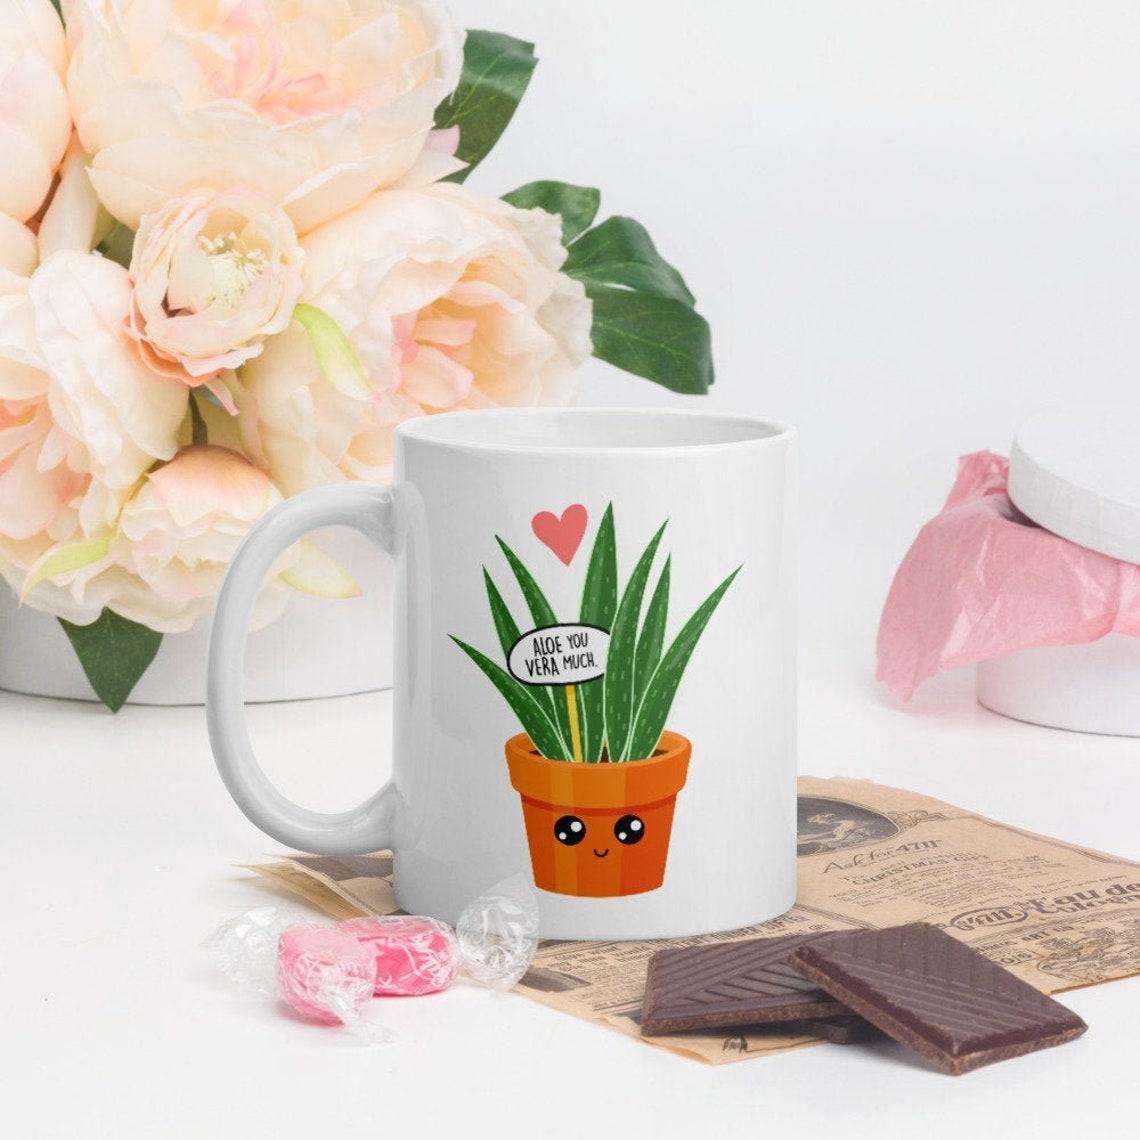 Aloe You Vera Much I love You Very Much Mug 11 Fluid ounces